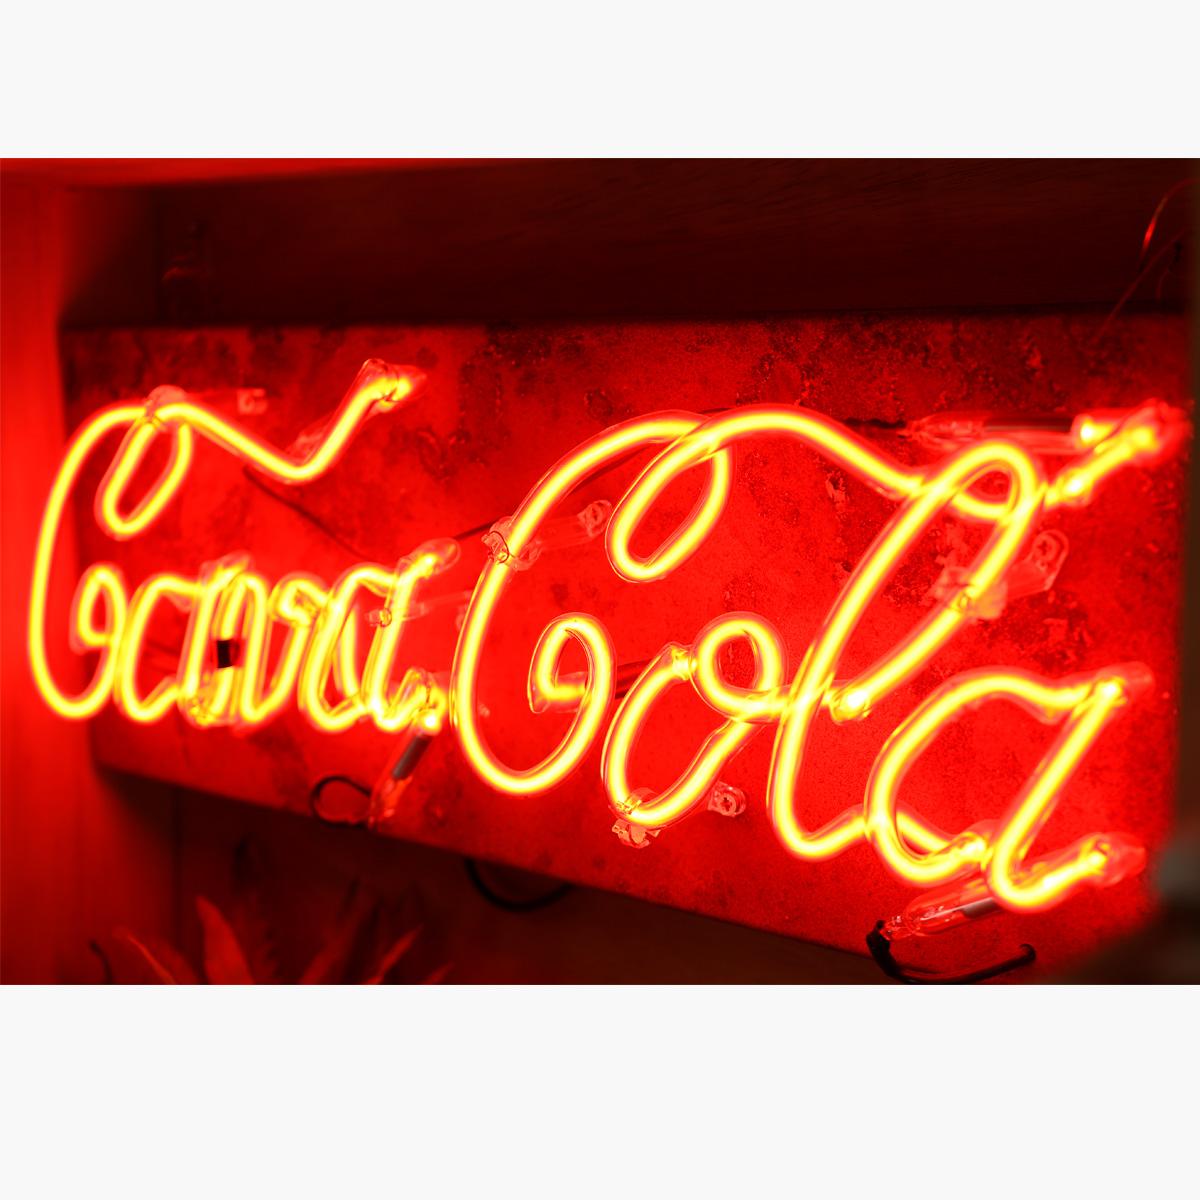 Cara Cola